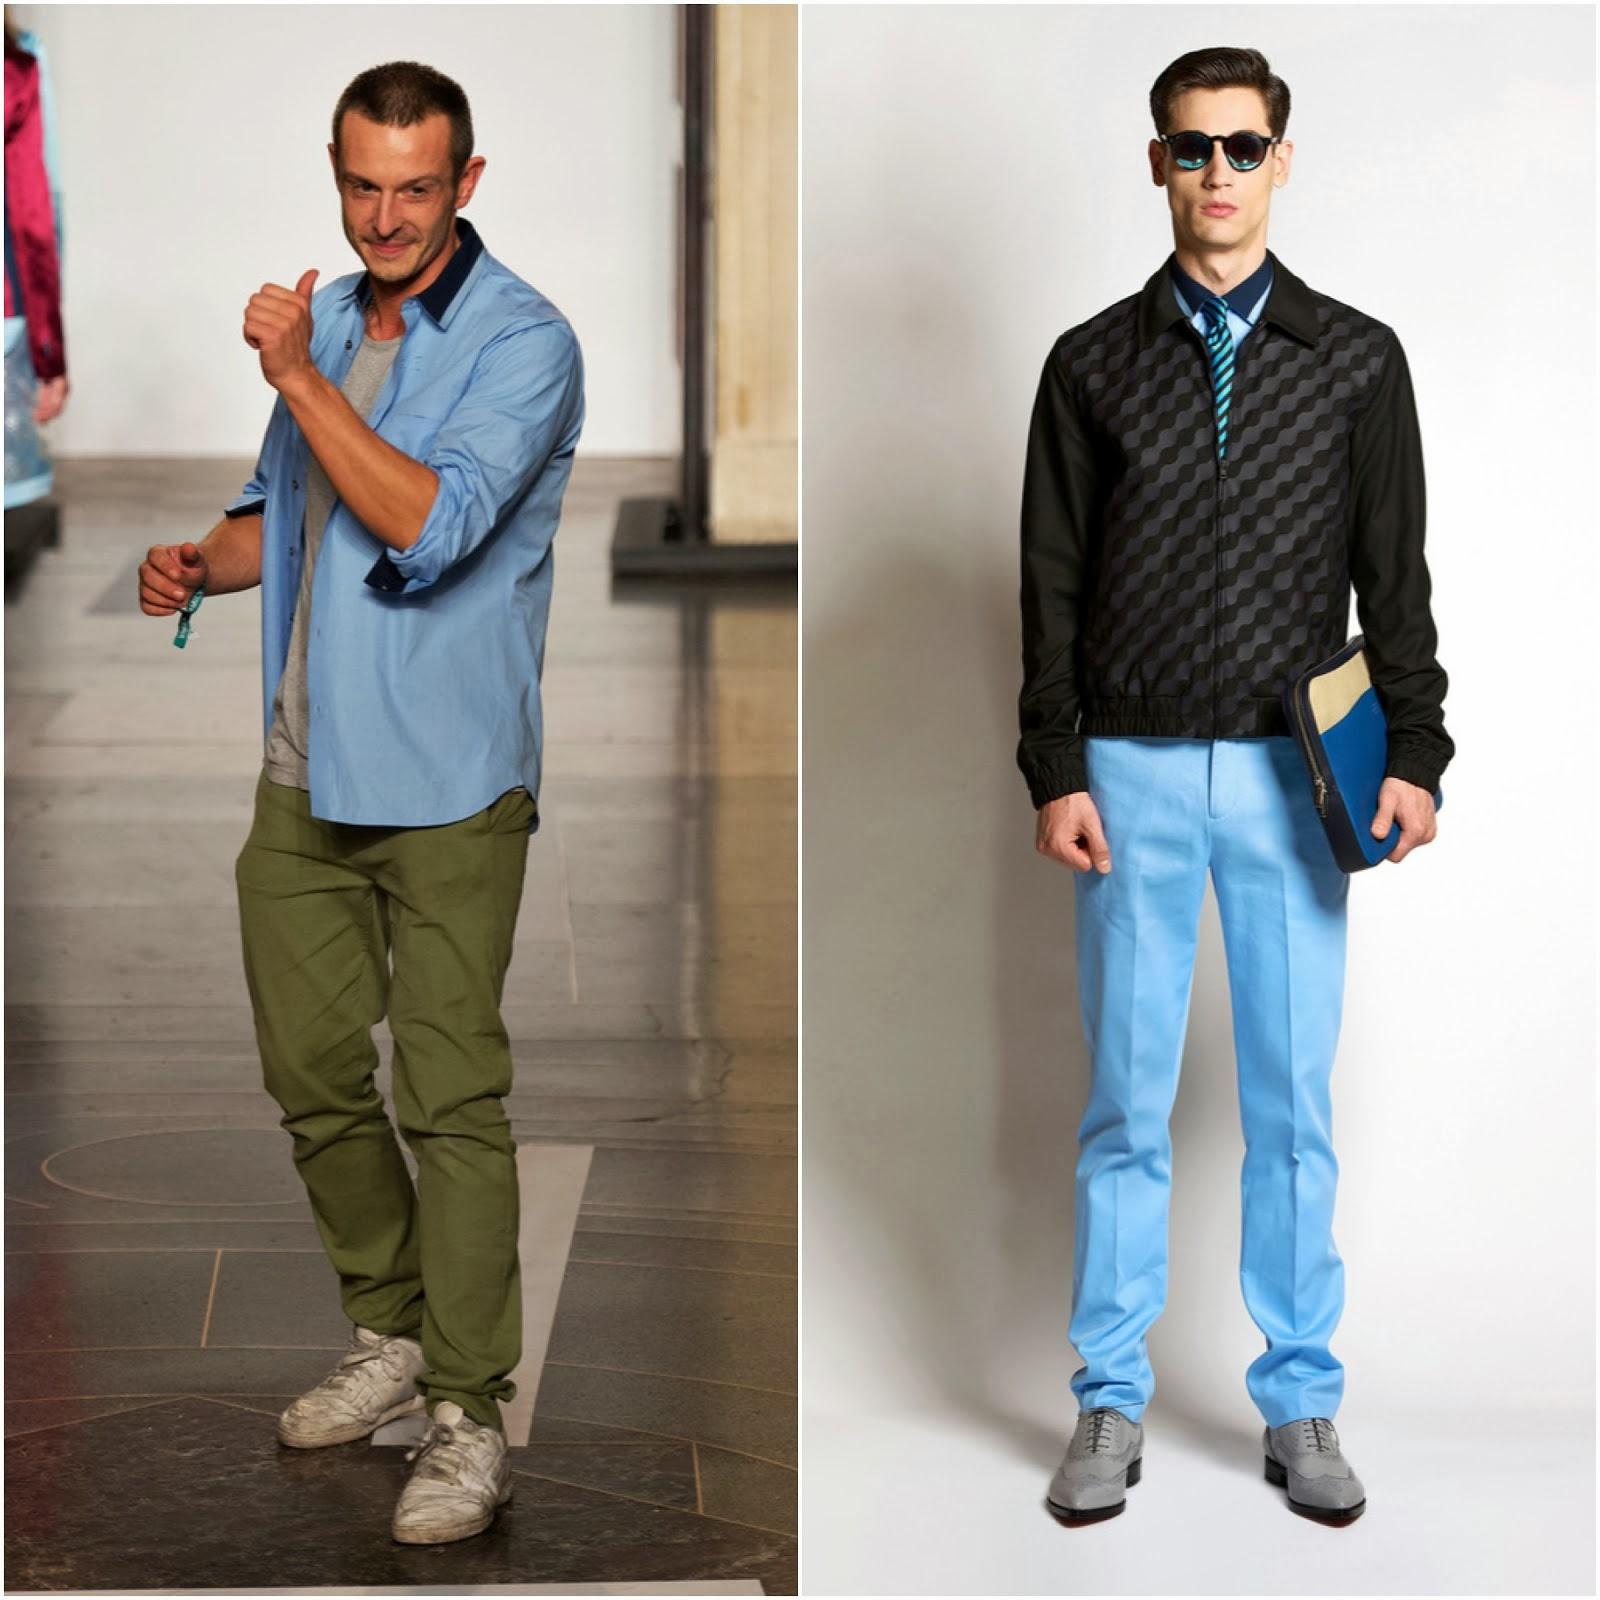 00O00 Menswear Blog: Jonathan Saunders Spring Summer 2014